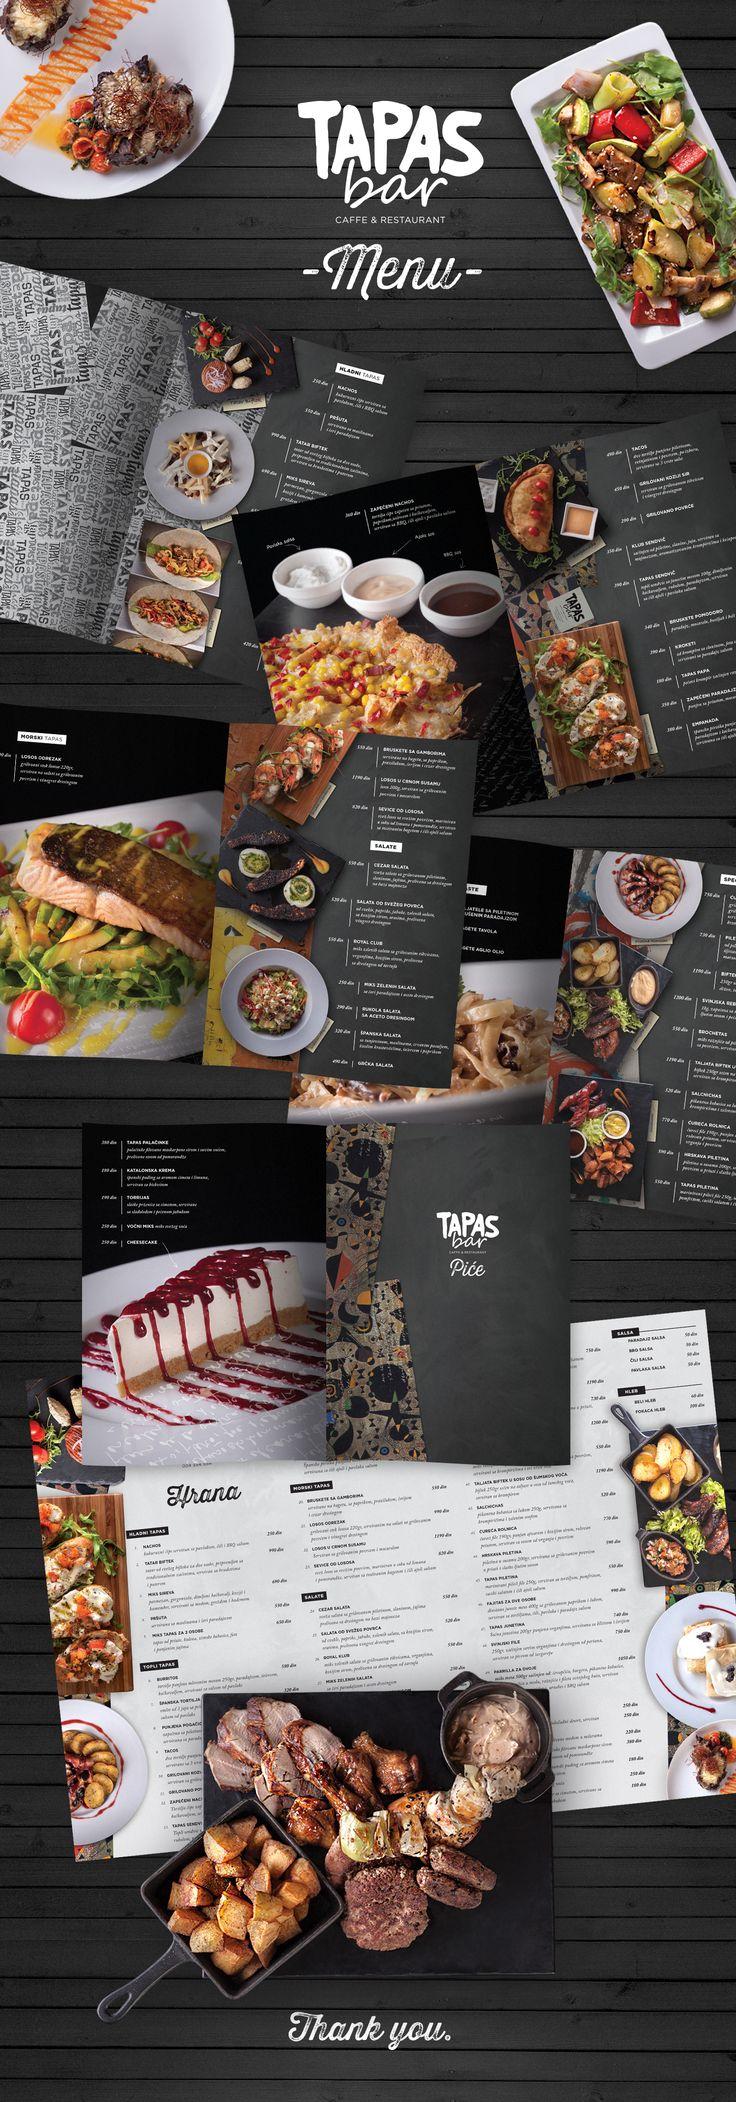 Menu design for Tapas Bar RestaurantDesign: Borko NerićPhotography: Strahinja Marković